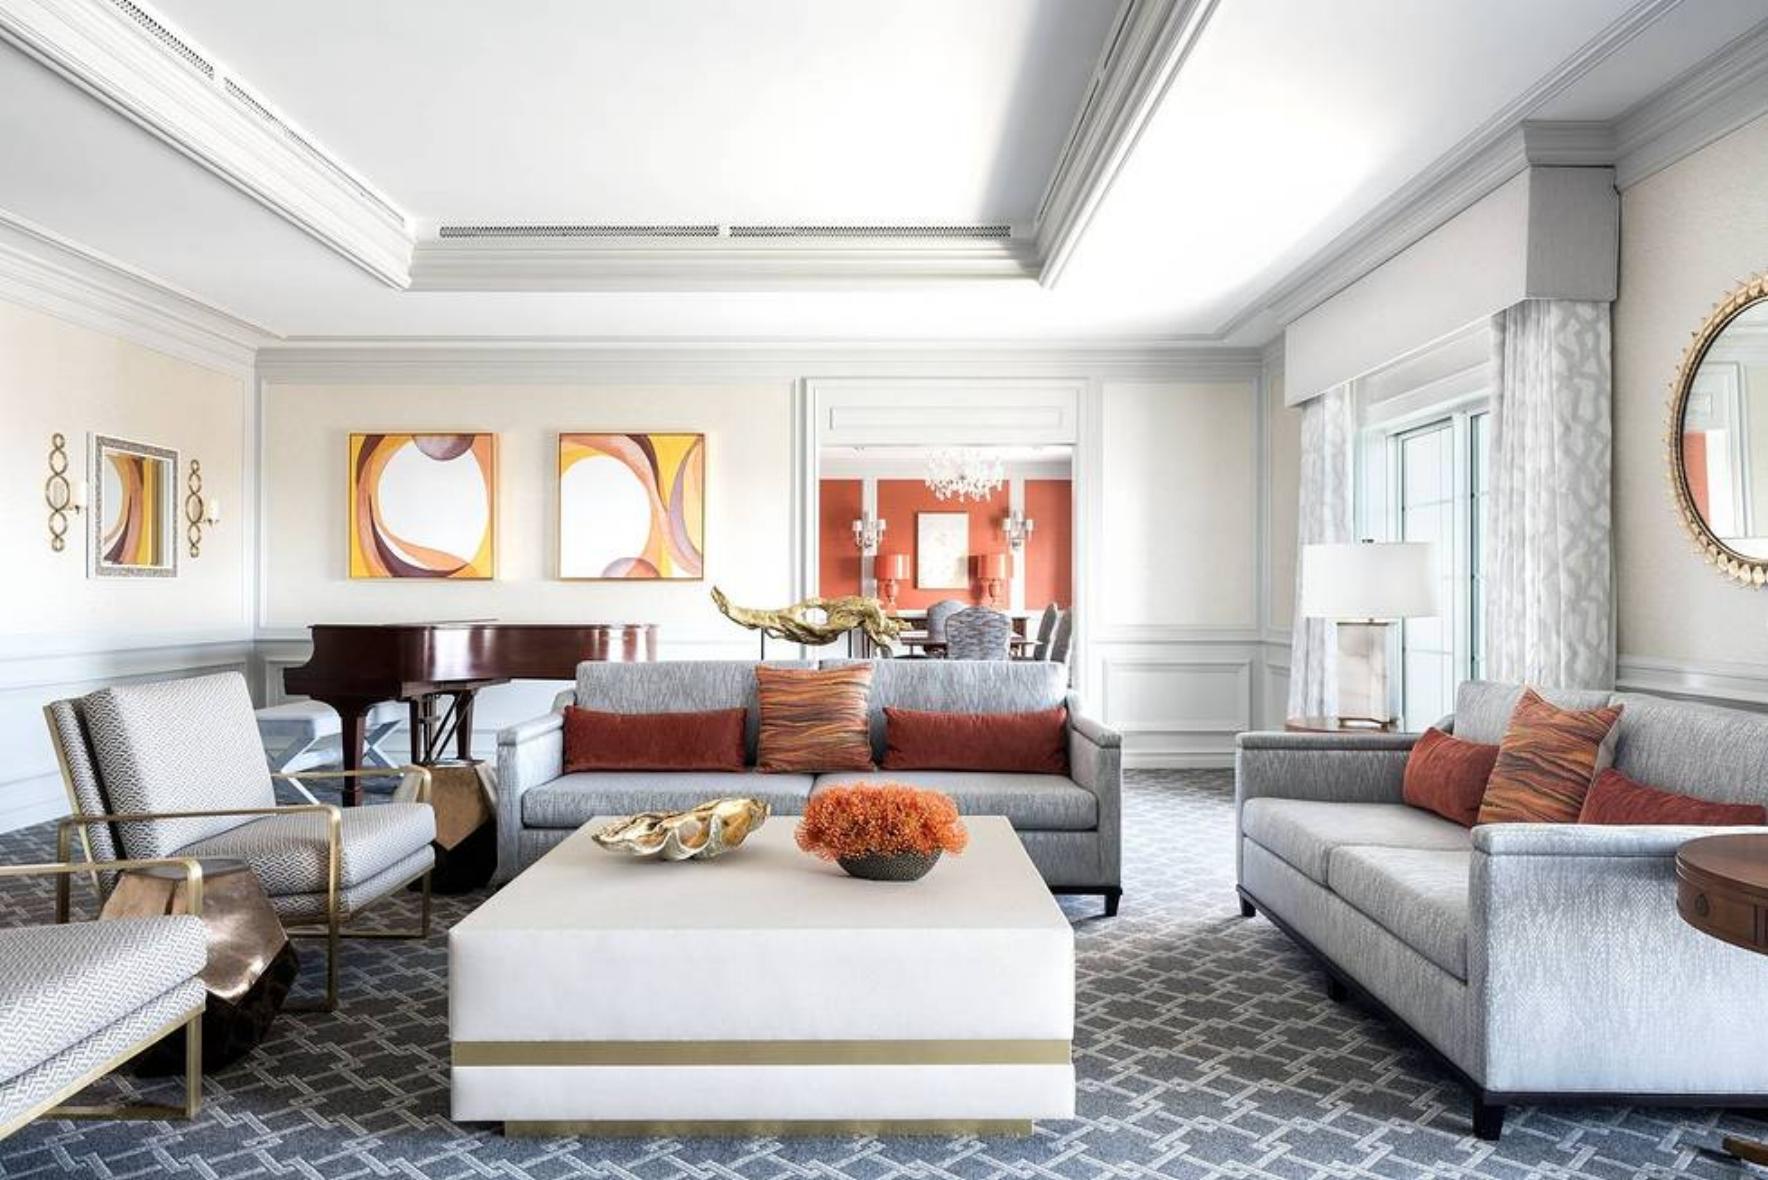 244 - Parker-Torres Design - The Chaise Lounge: Interior Design Podcast